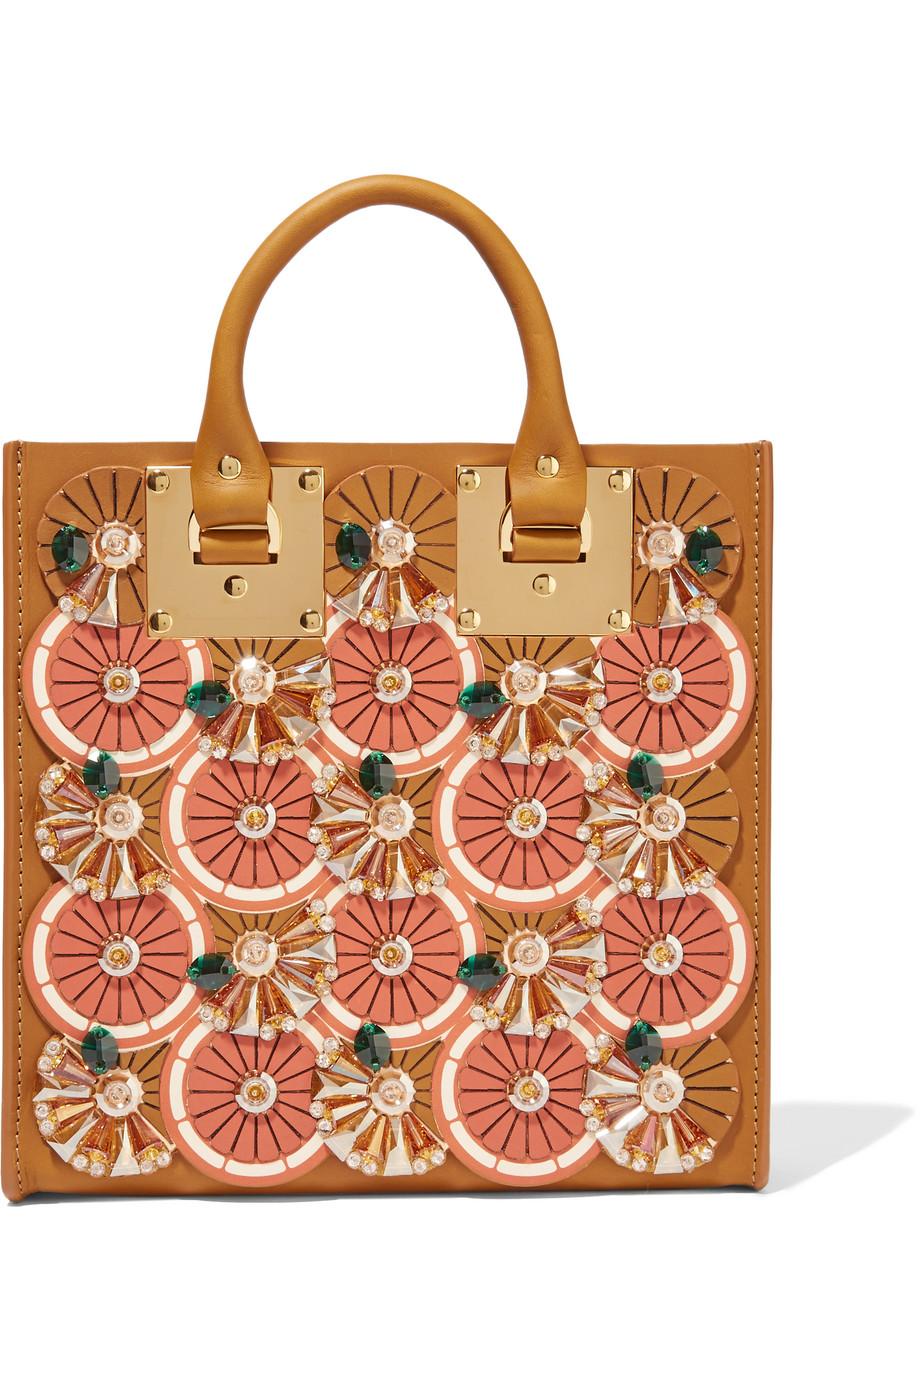 Sophie Hulme Albion Embellished Matte-Leather Tote, Tan/Orange, Women's